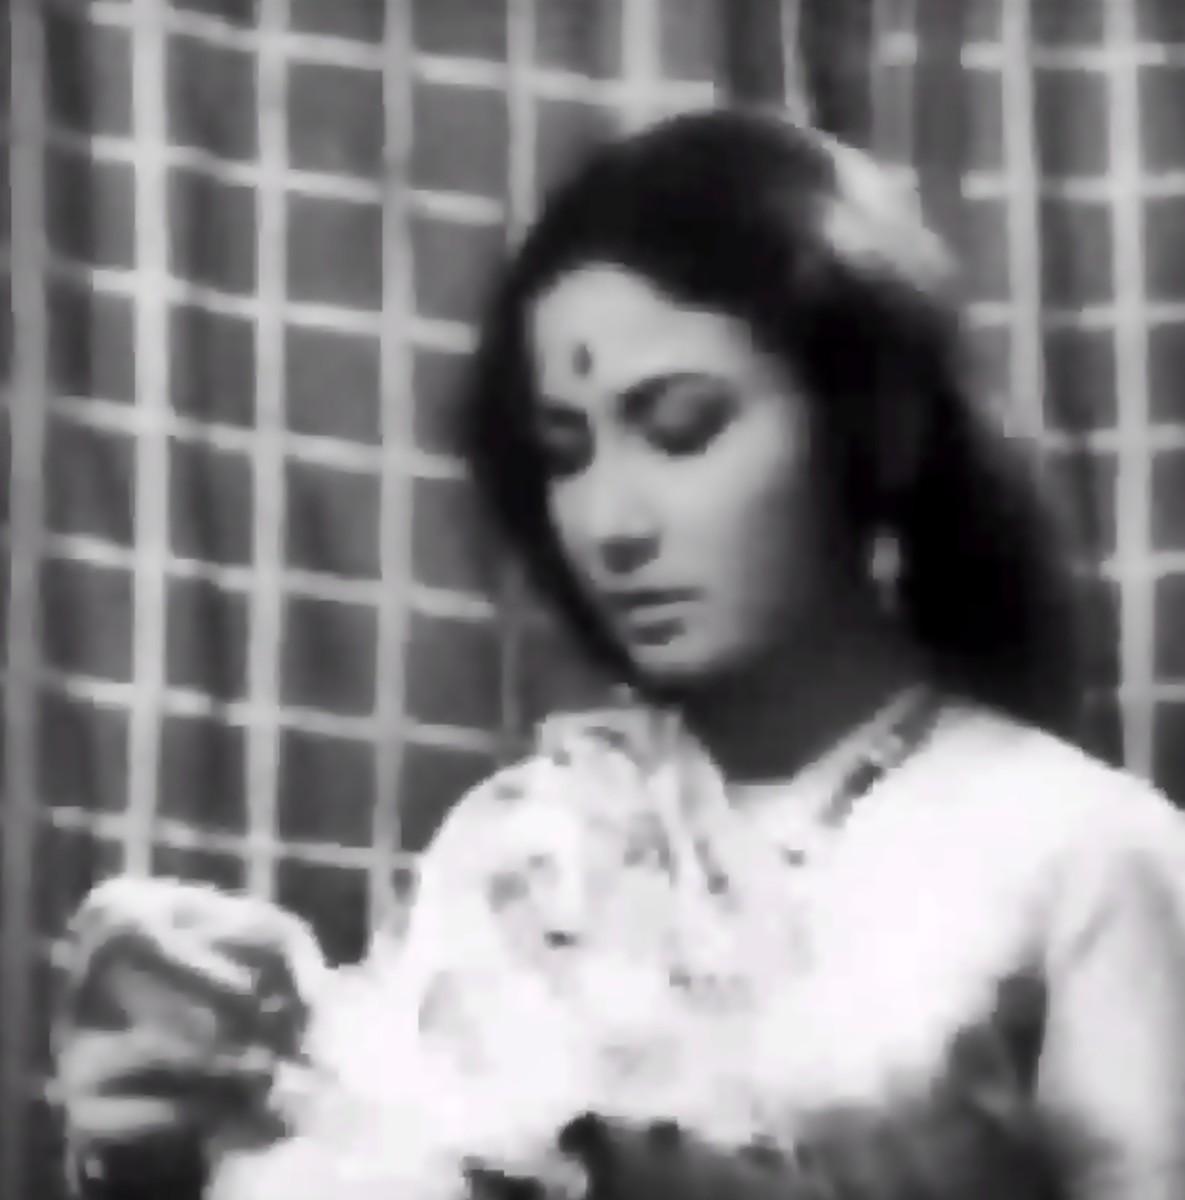 Meena Kumari in Jyoti kalash chhalake...: A great classical number in Raag Bhupali by Lata Mangeshkar